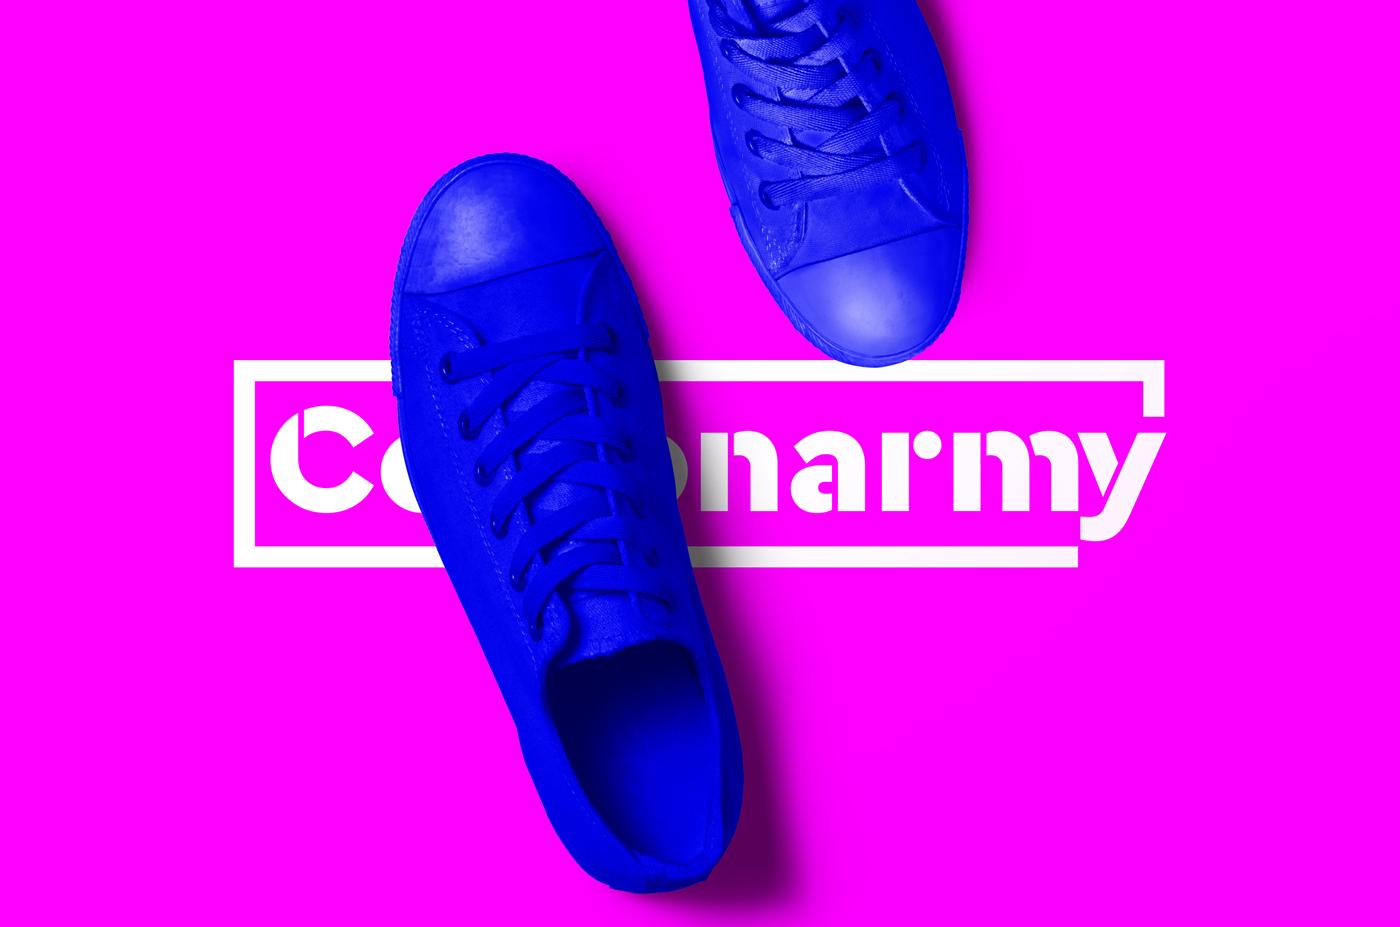 cottonarmy_4